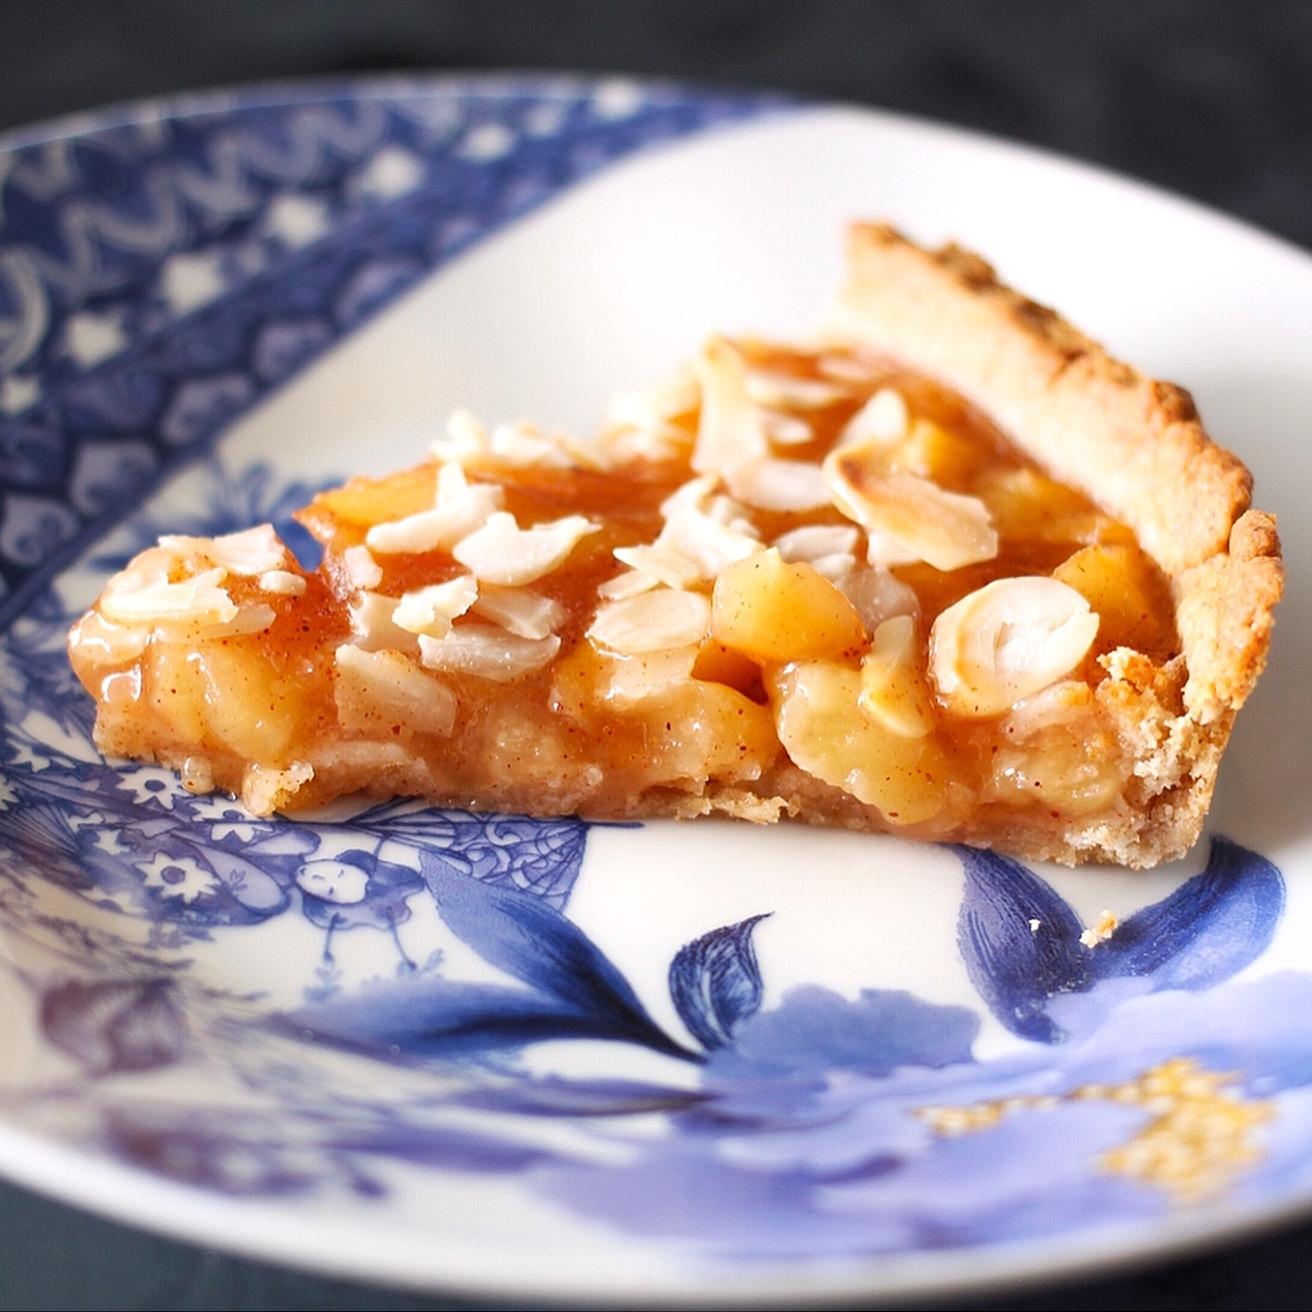 healthy classic apple pie by @kitchenart_ist